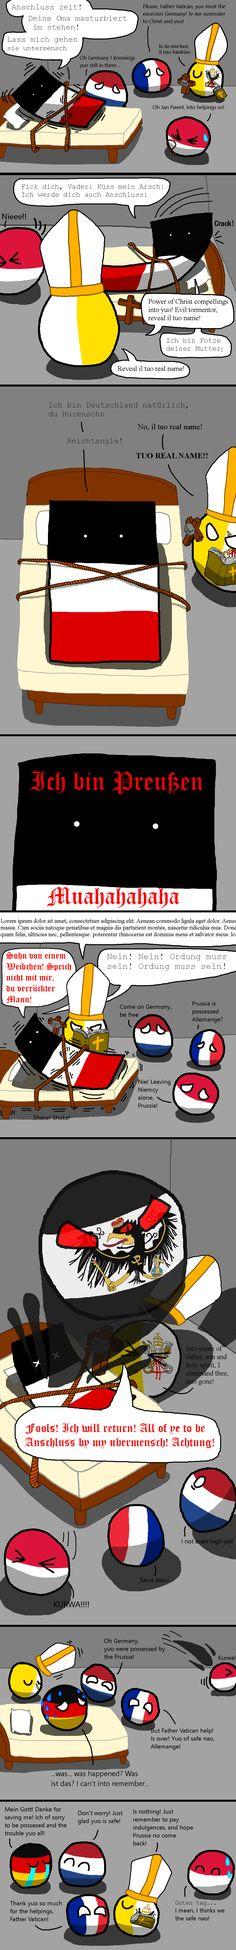 The Exorcism of Ein Reich - Polandball